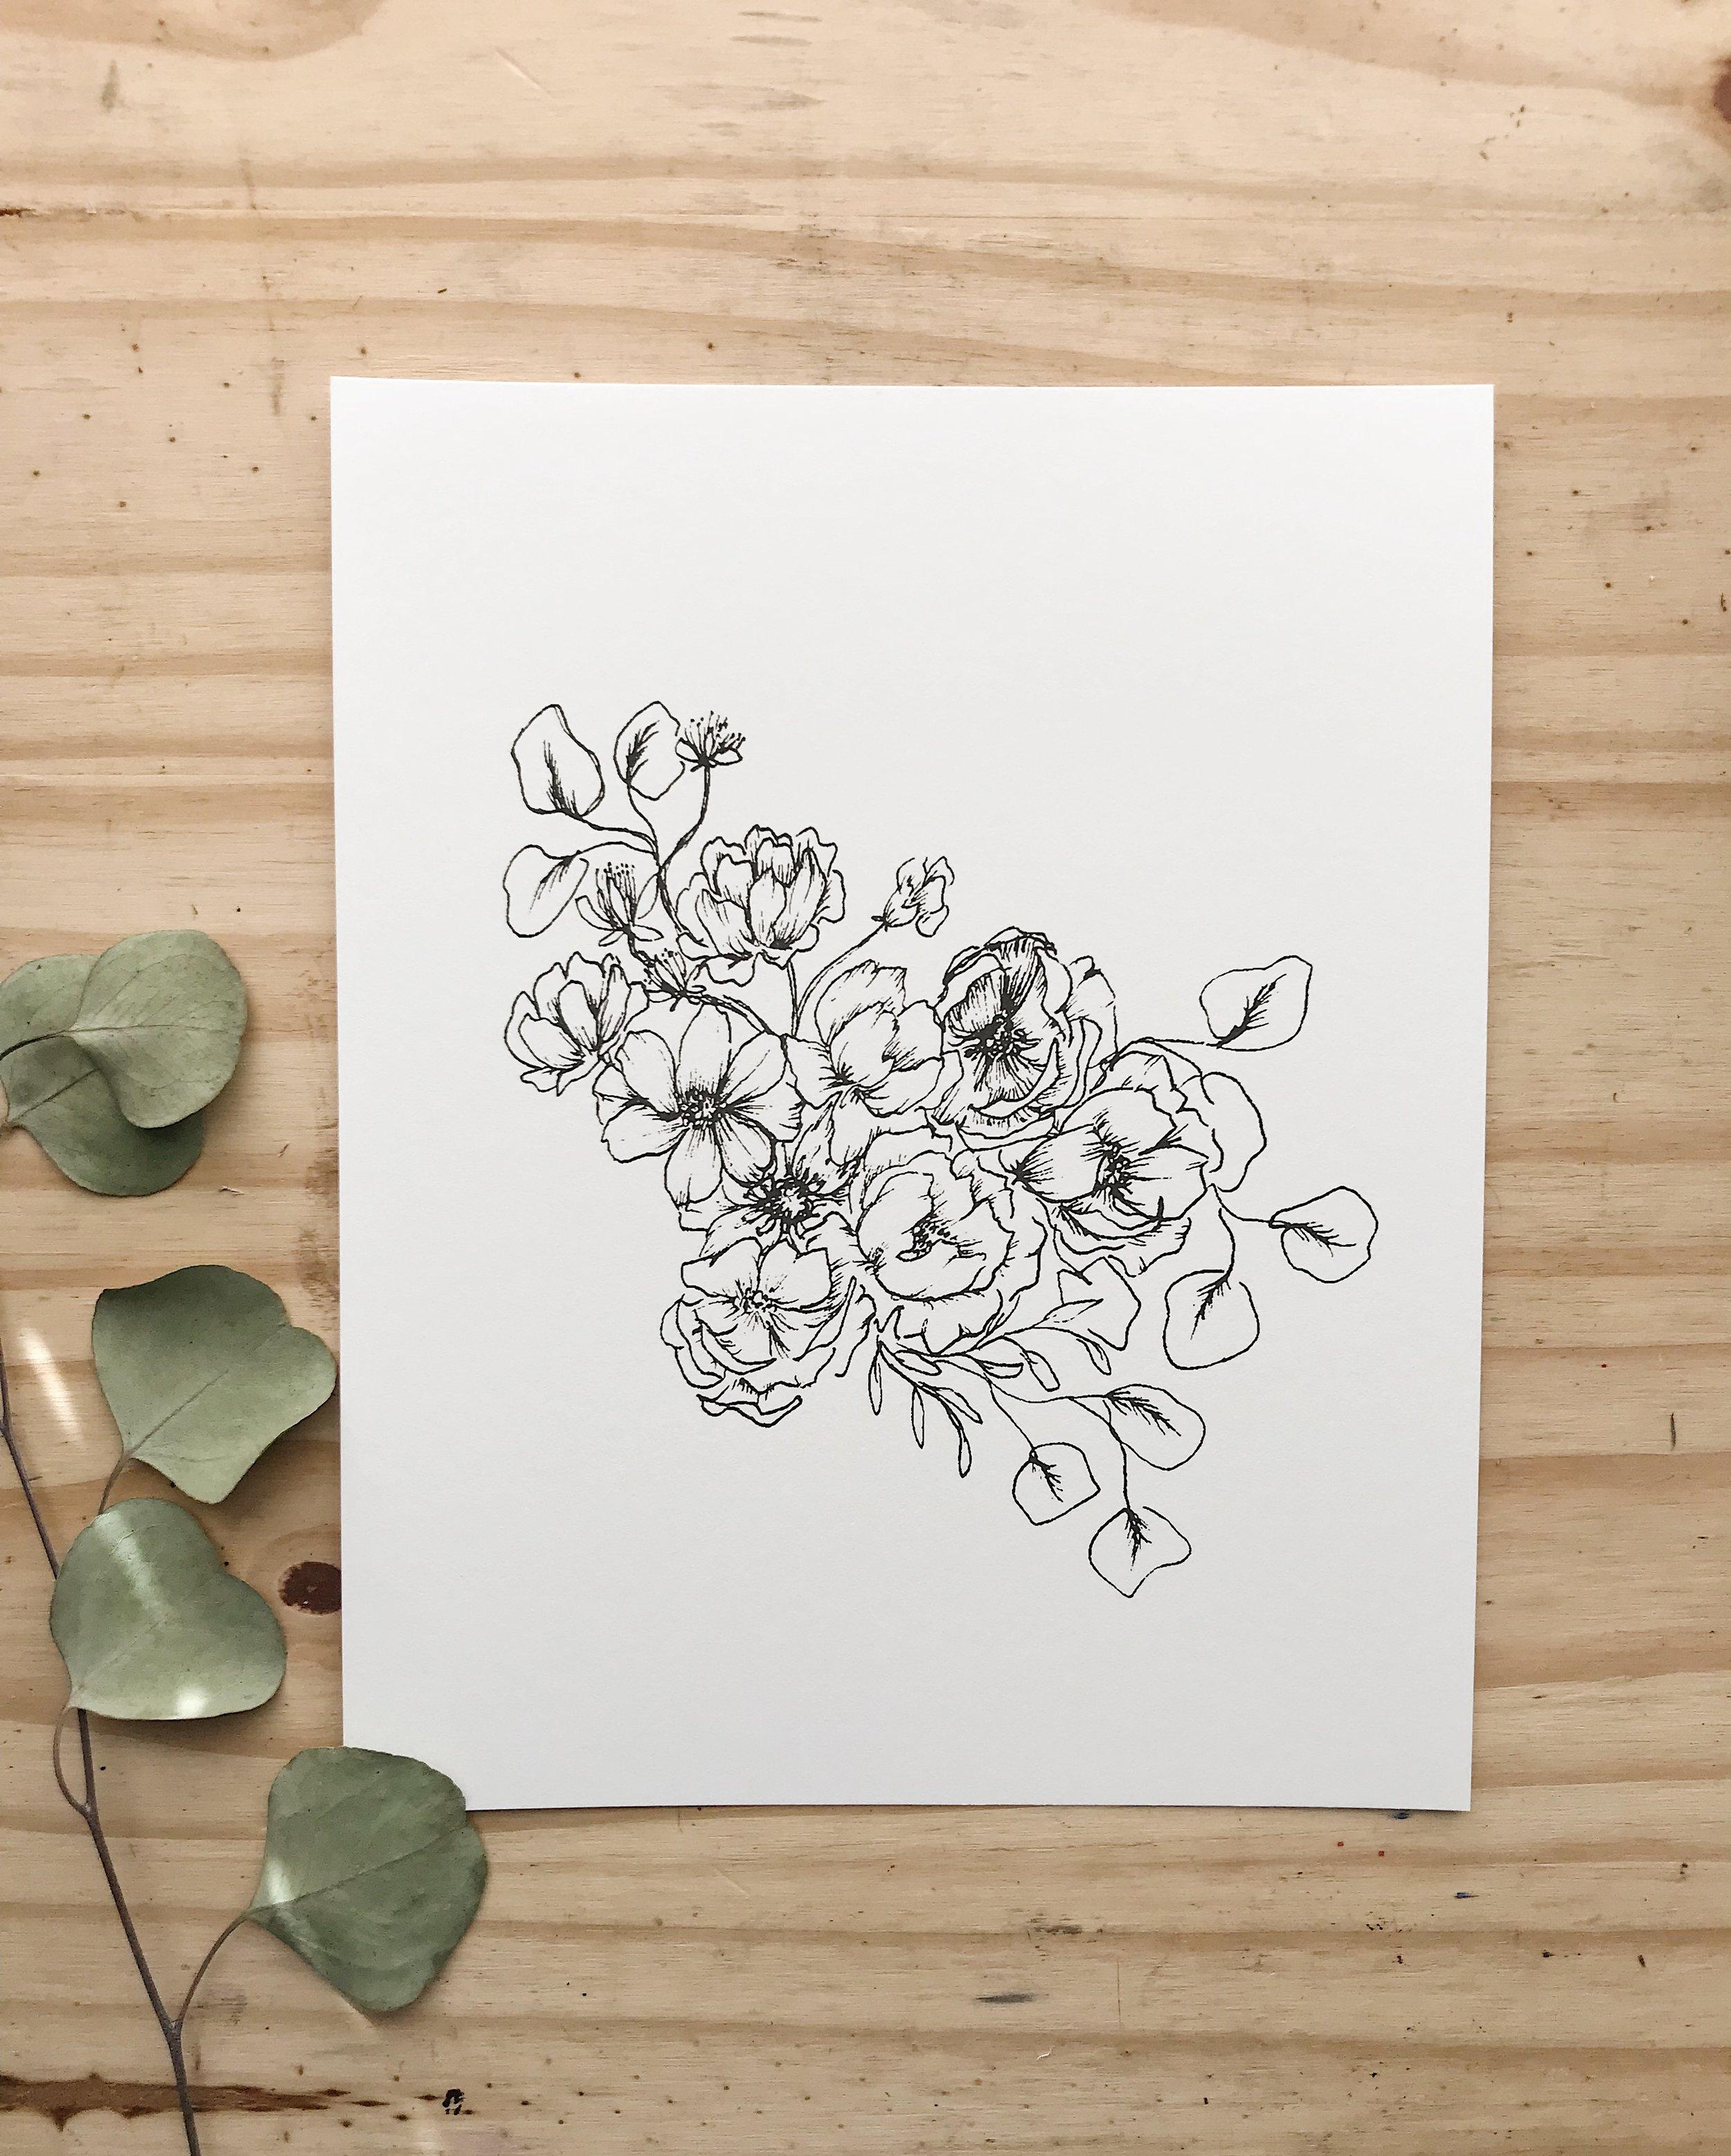 FloralIllustration001_AnIntroduction_astrantia_garden rose_eucalyptus_carnation_cosmos_anemone